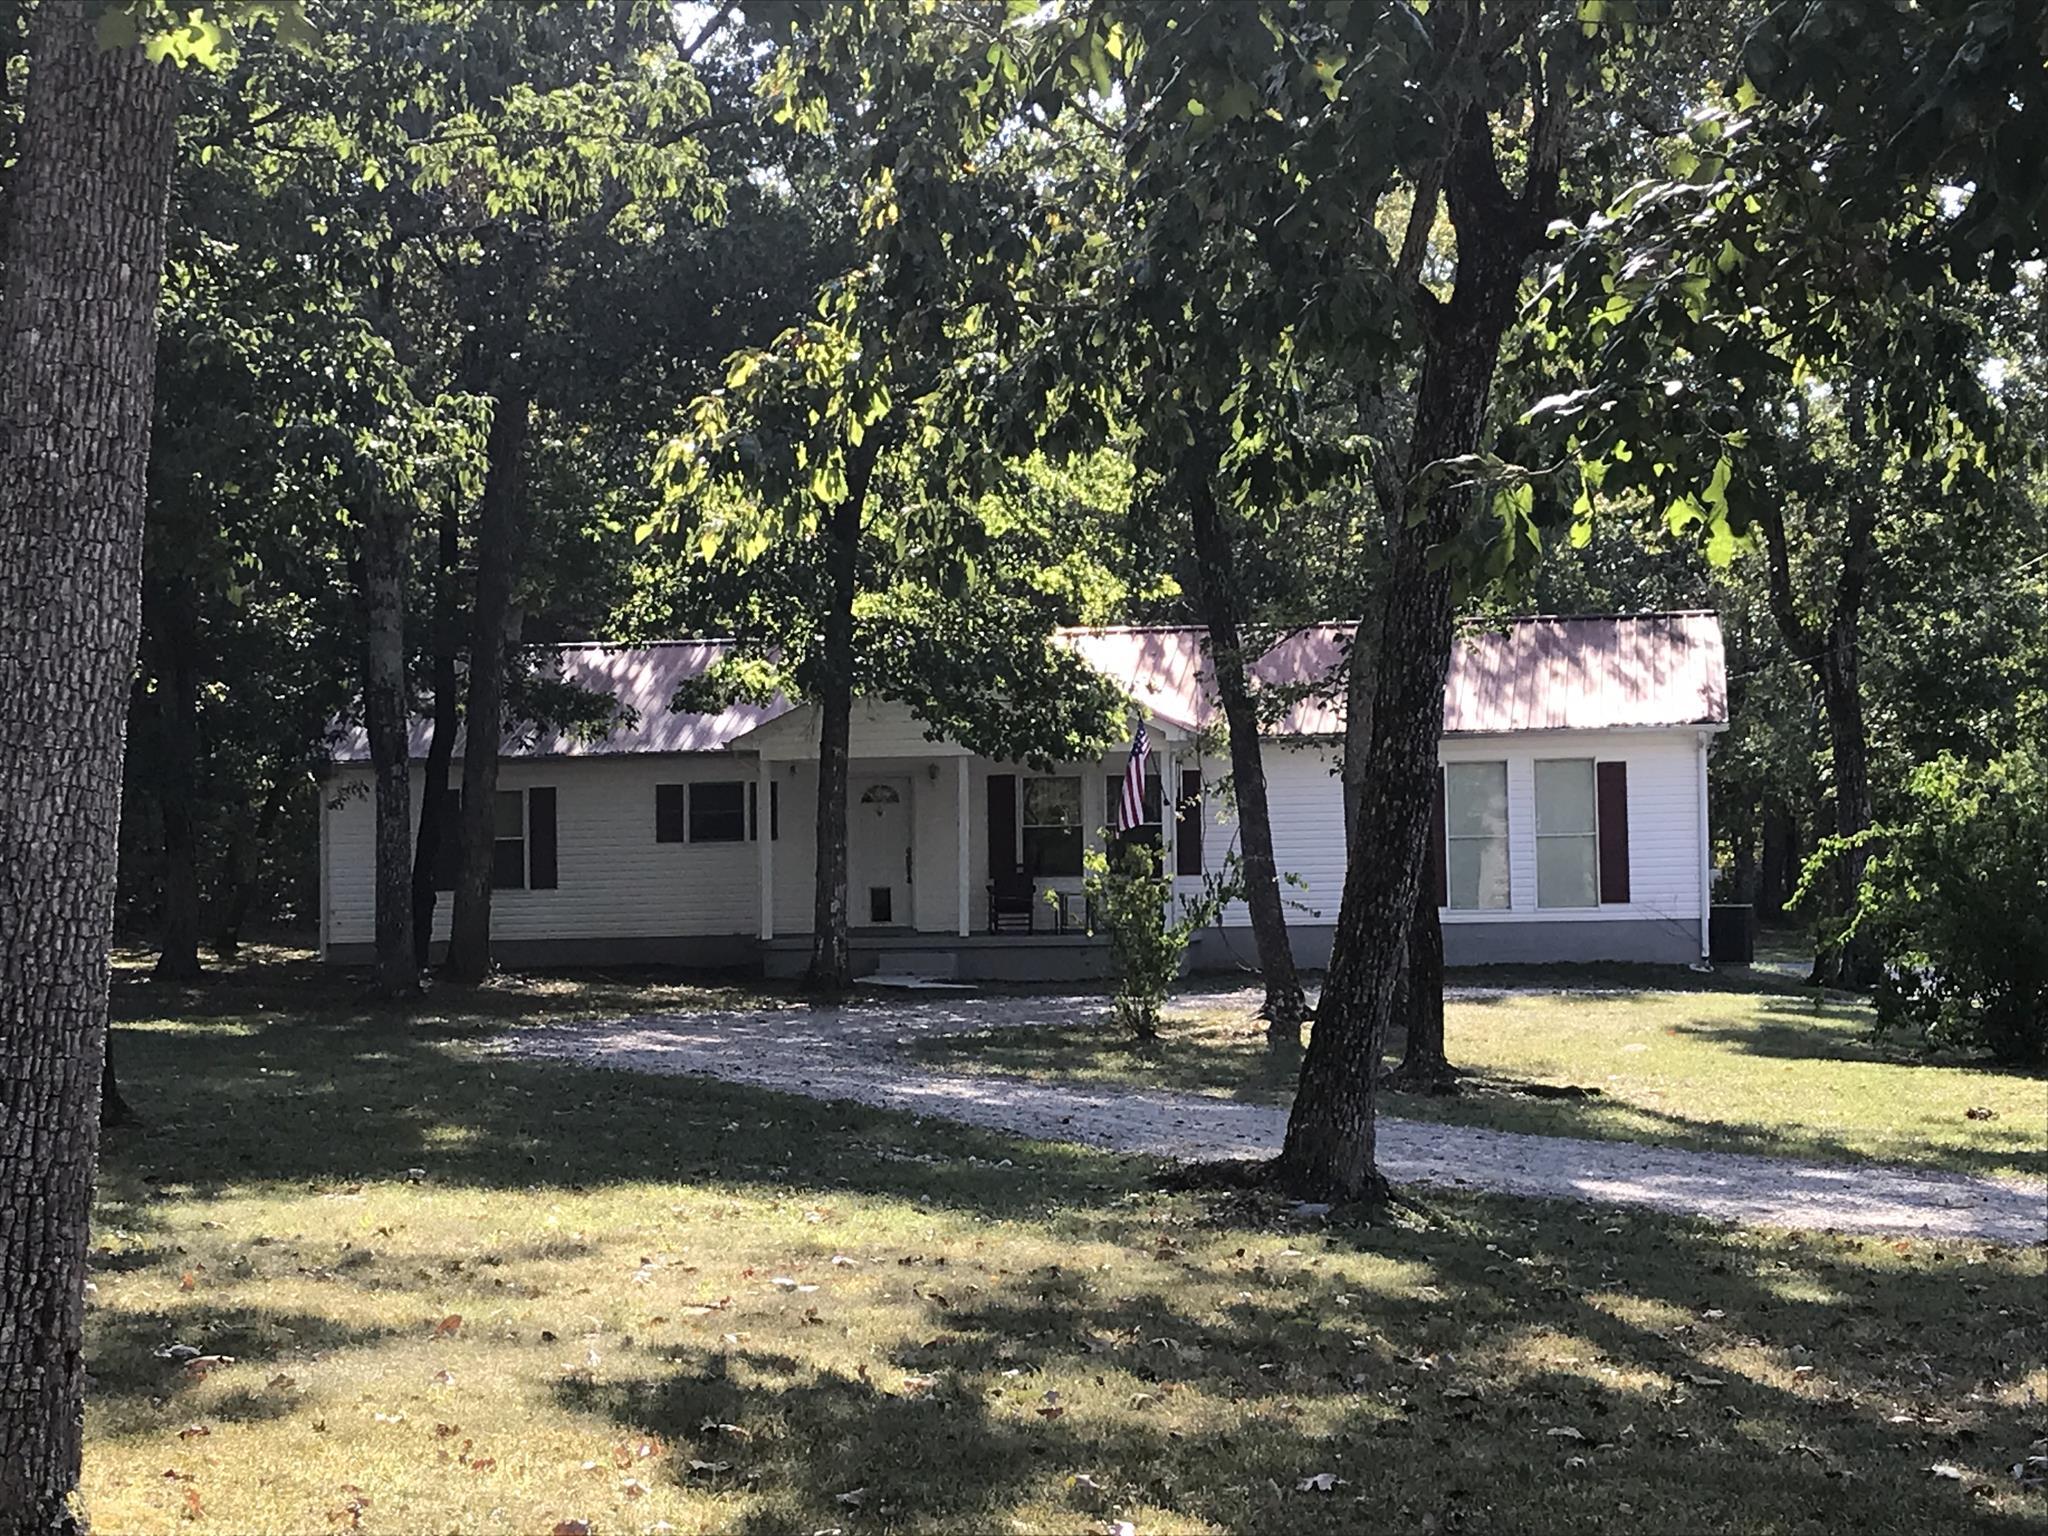 656 Mount Herman Rd, Murfreesboro, TN 37127 - Murfreesboro, TN real estate listing